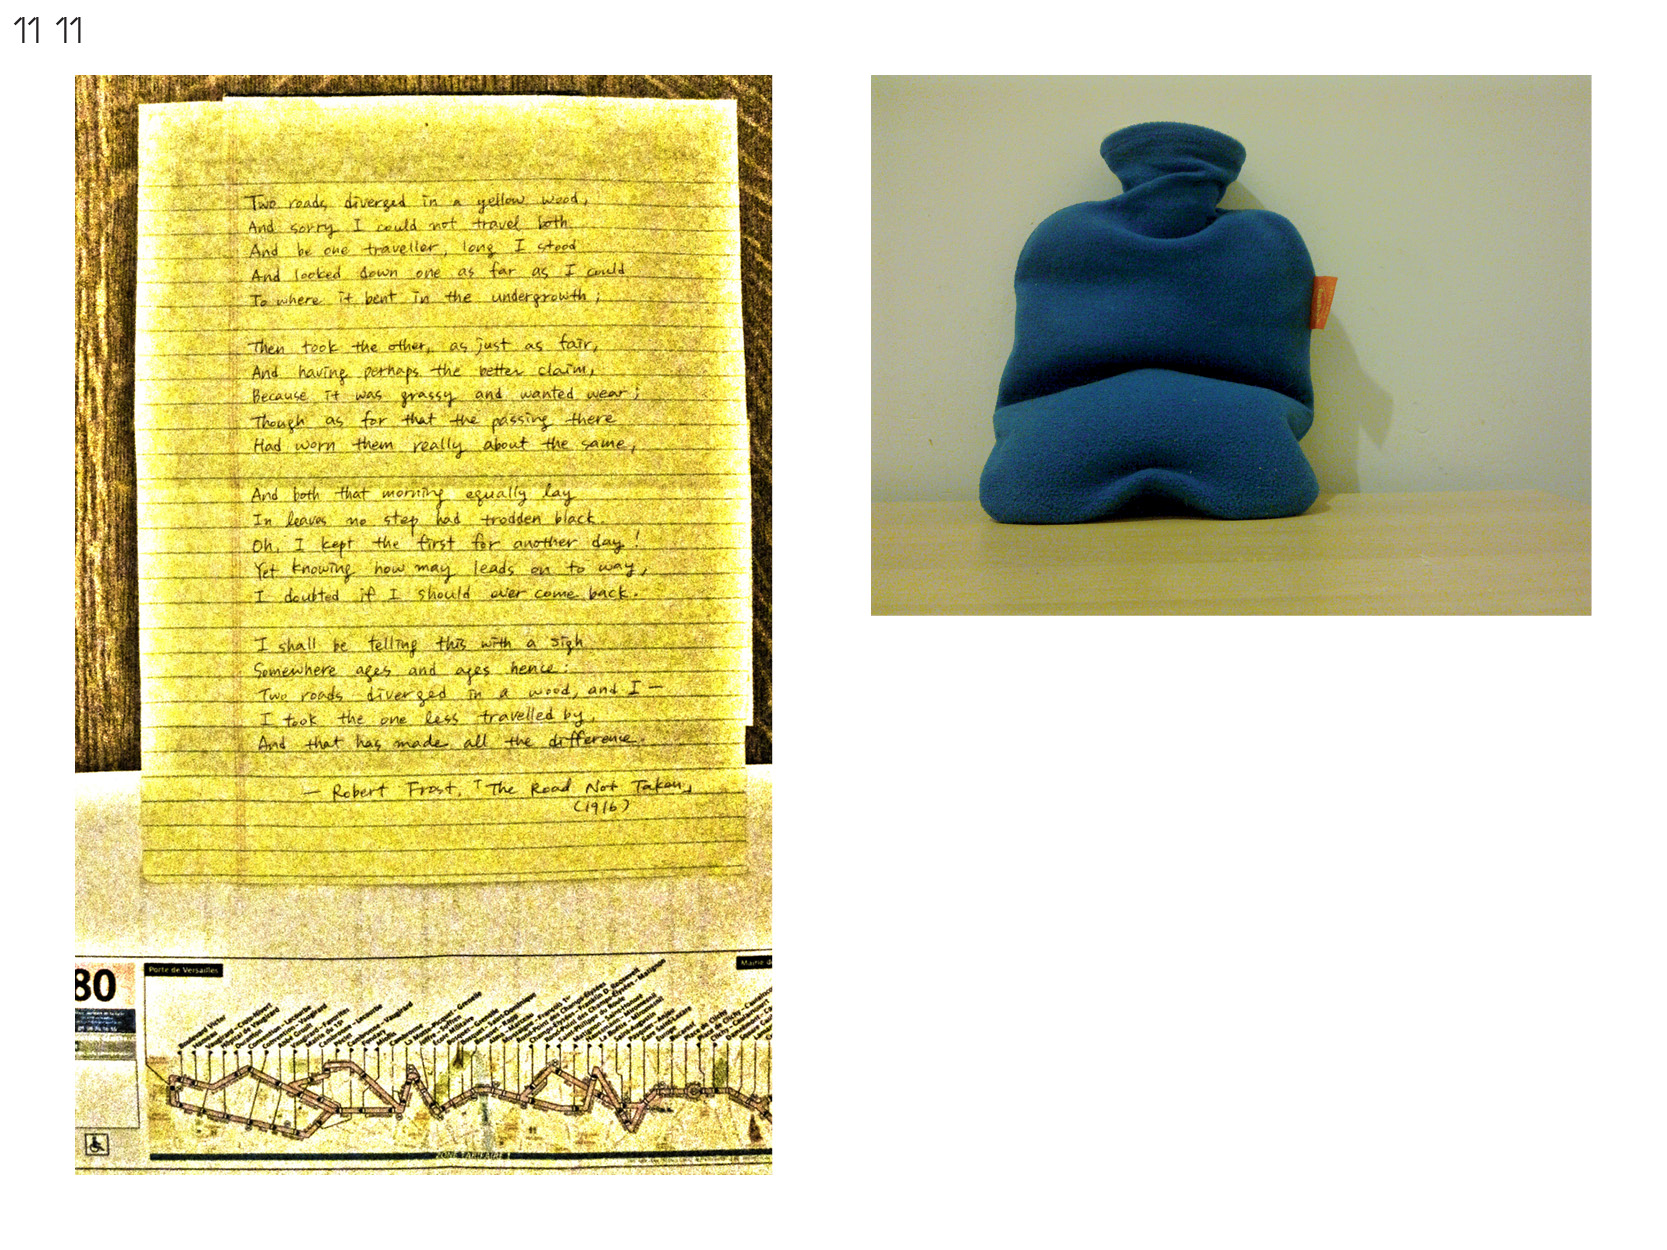 Gerrit-Schweiger-Dialog-Städte-Paris-Berlin-Jessica-Blank-Experiment-Fotoserie-Tagebuch-visuelle-Kommunikation-26